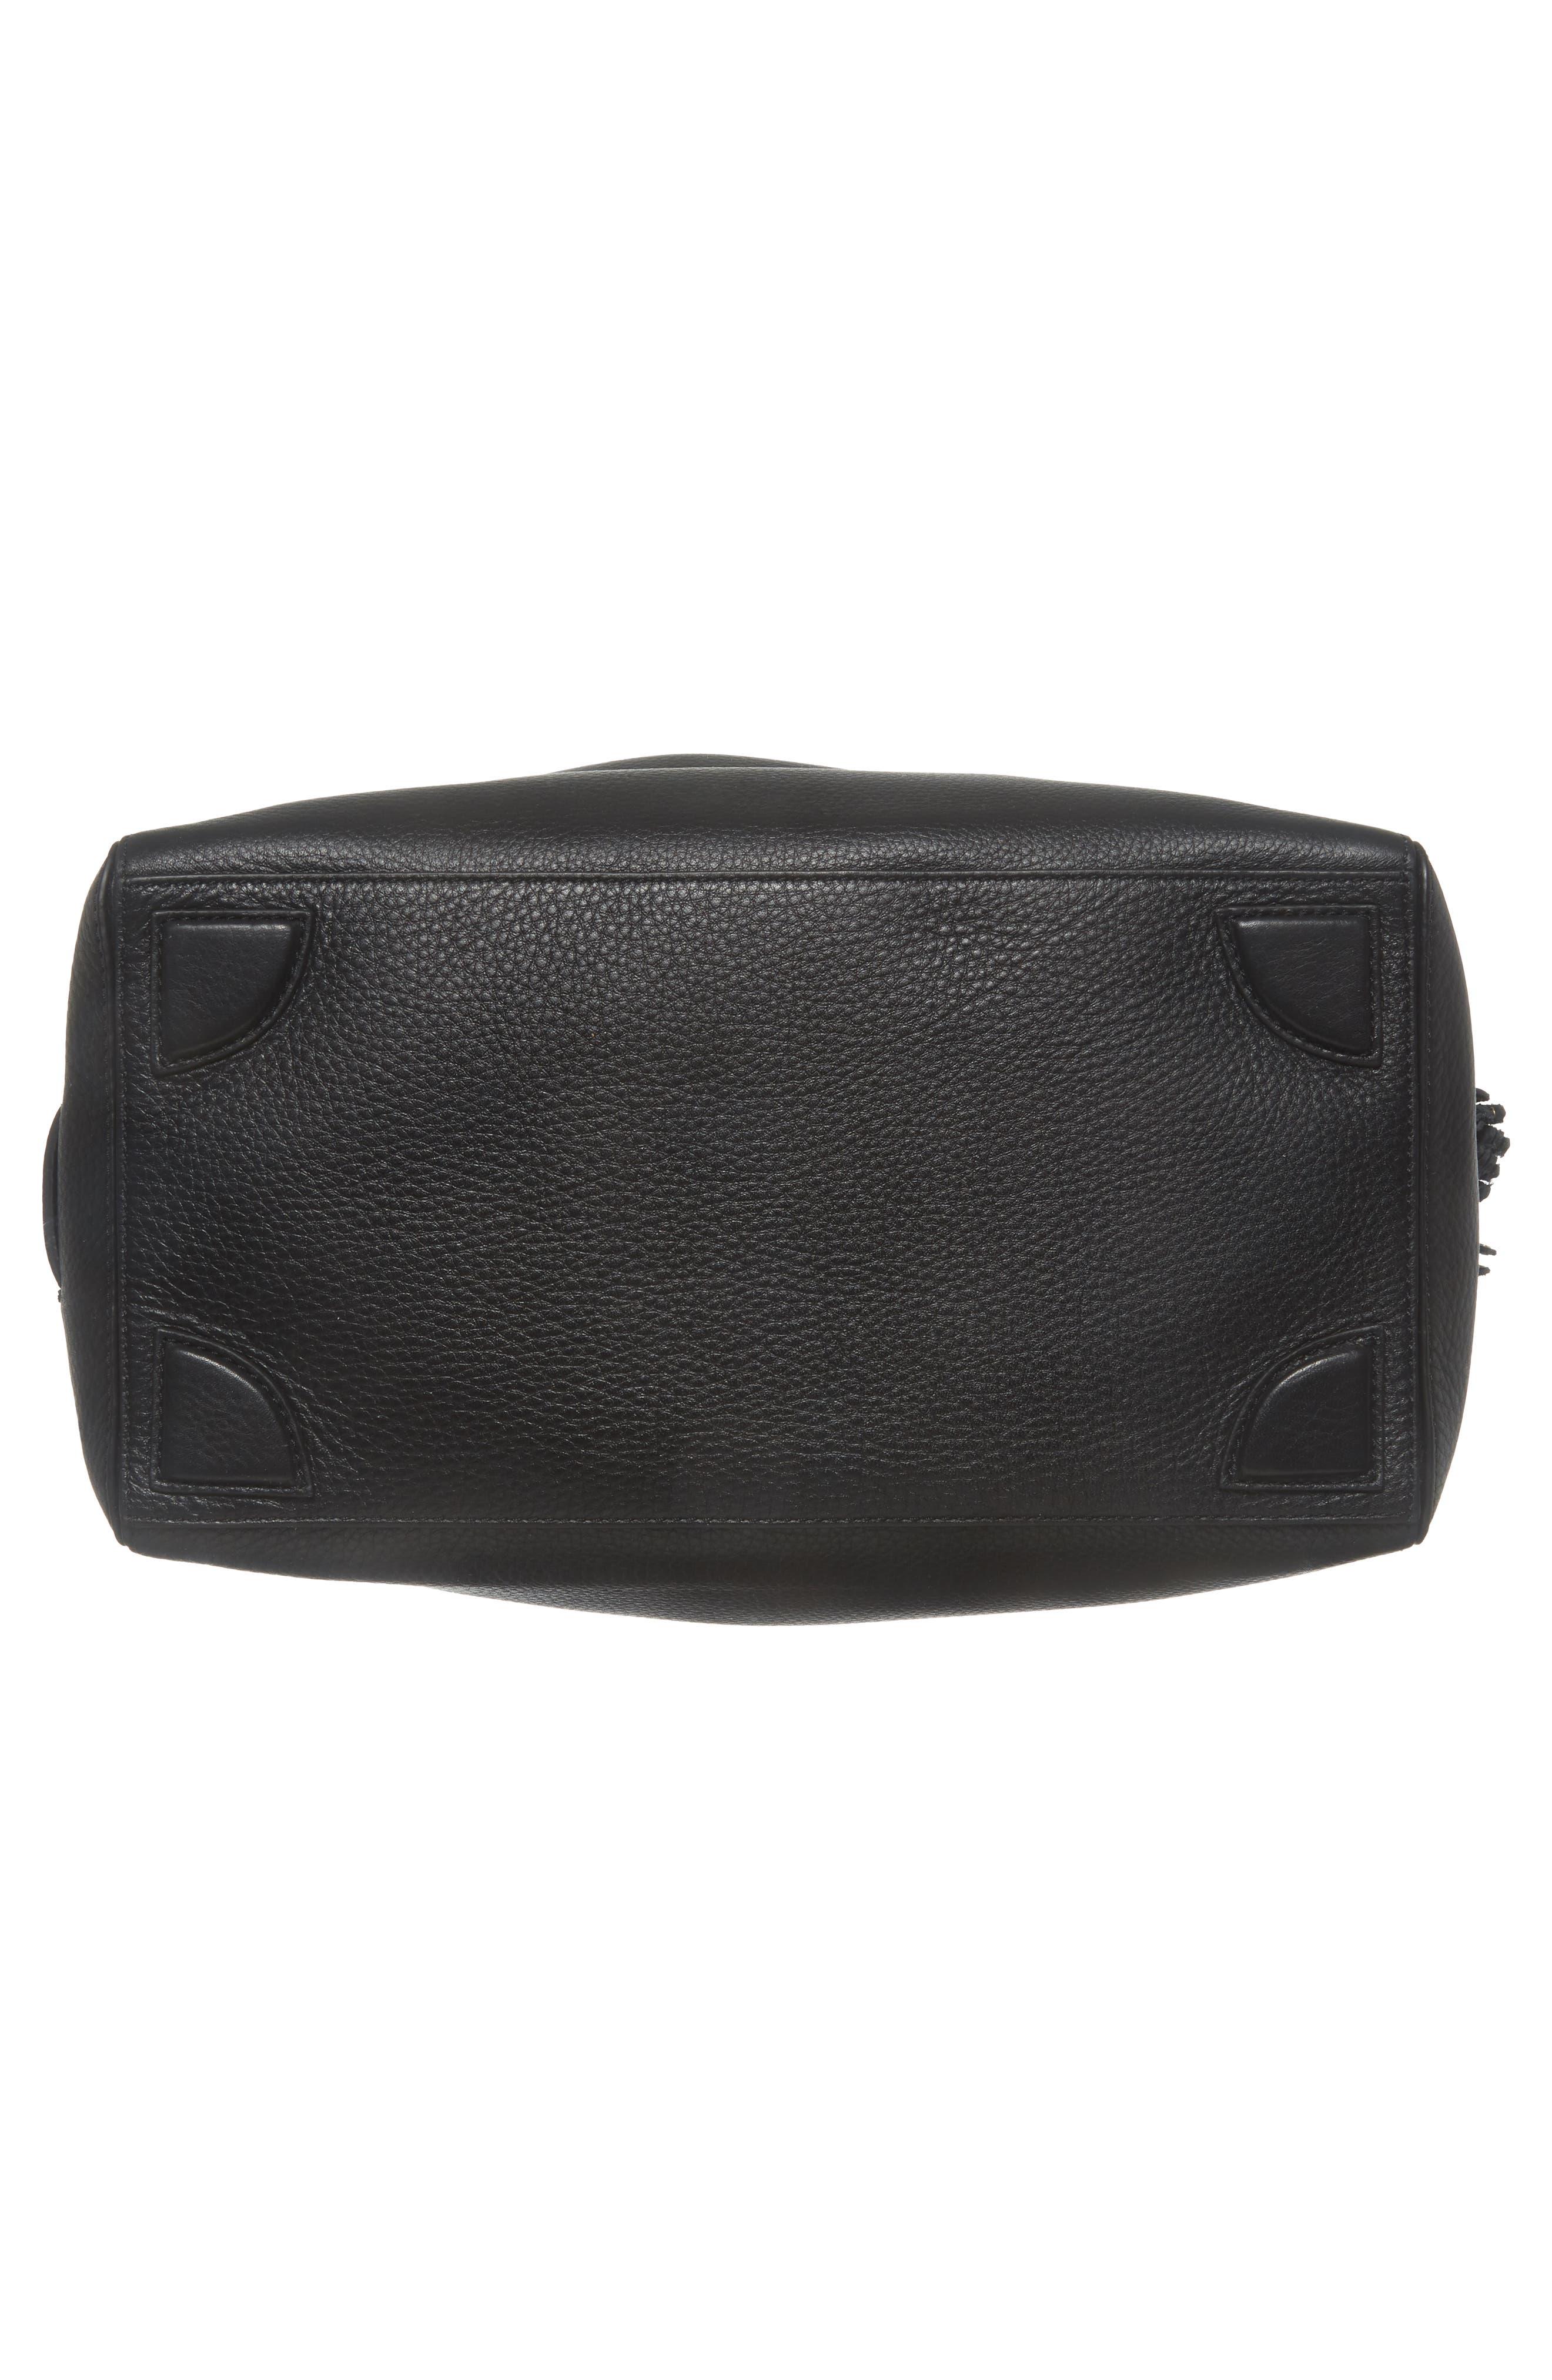 Cassidy RFID Pebbled Leather Bucket Bag,                             Alternate thumbnail 6, color,                             001